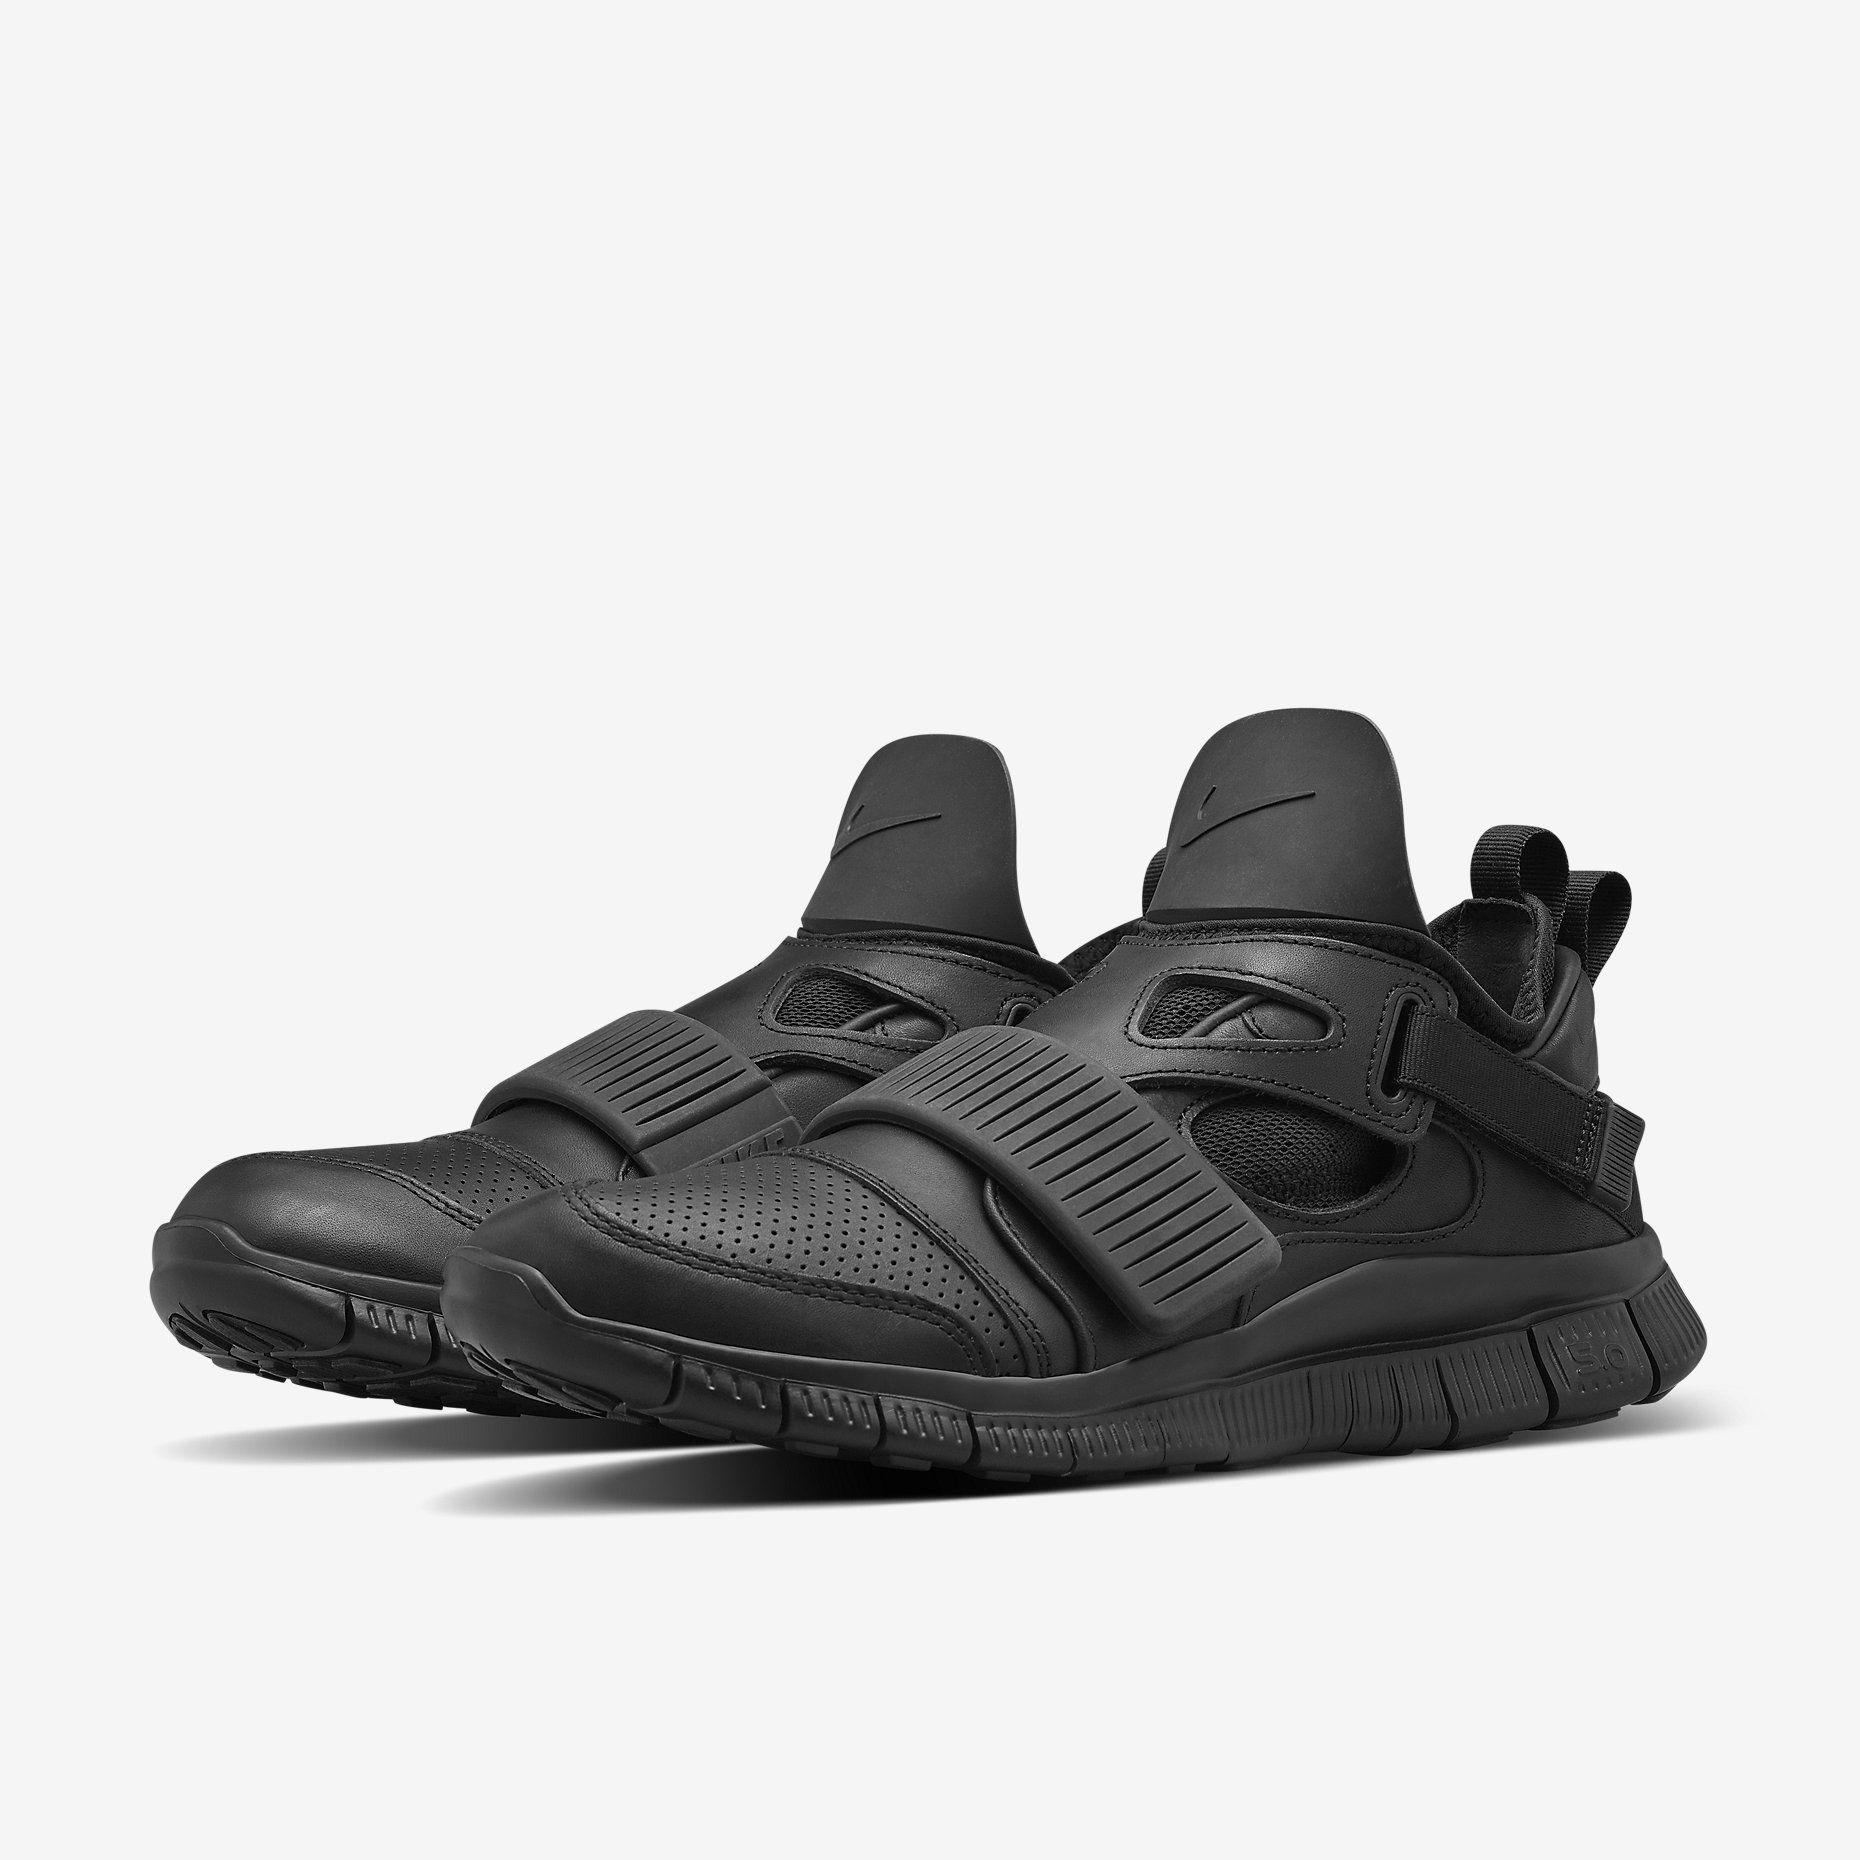 46398ffb351 NikeLab Free Huarache Carnivore Men s Shoe. Nike.com